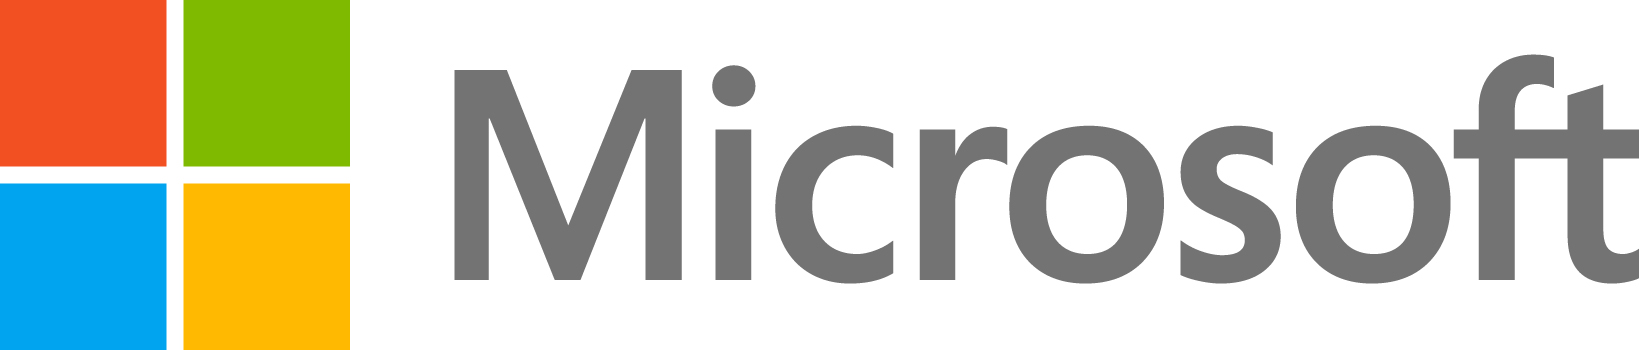 http://www.3b-it.co.uk/technoshack/ancillary/images/microsoft-logo.jpg